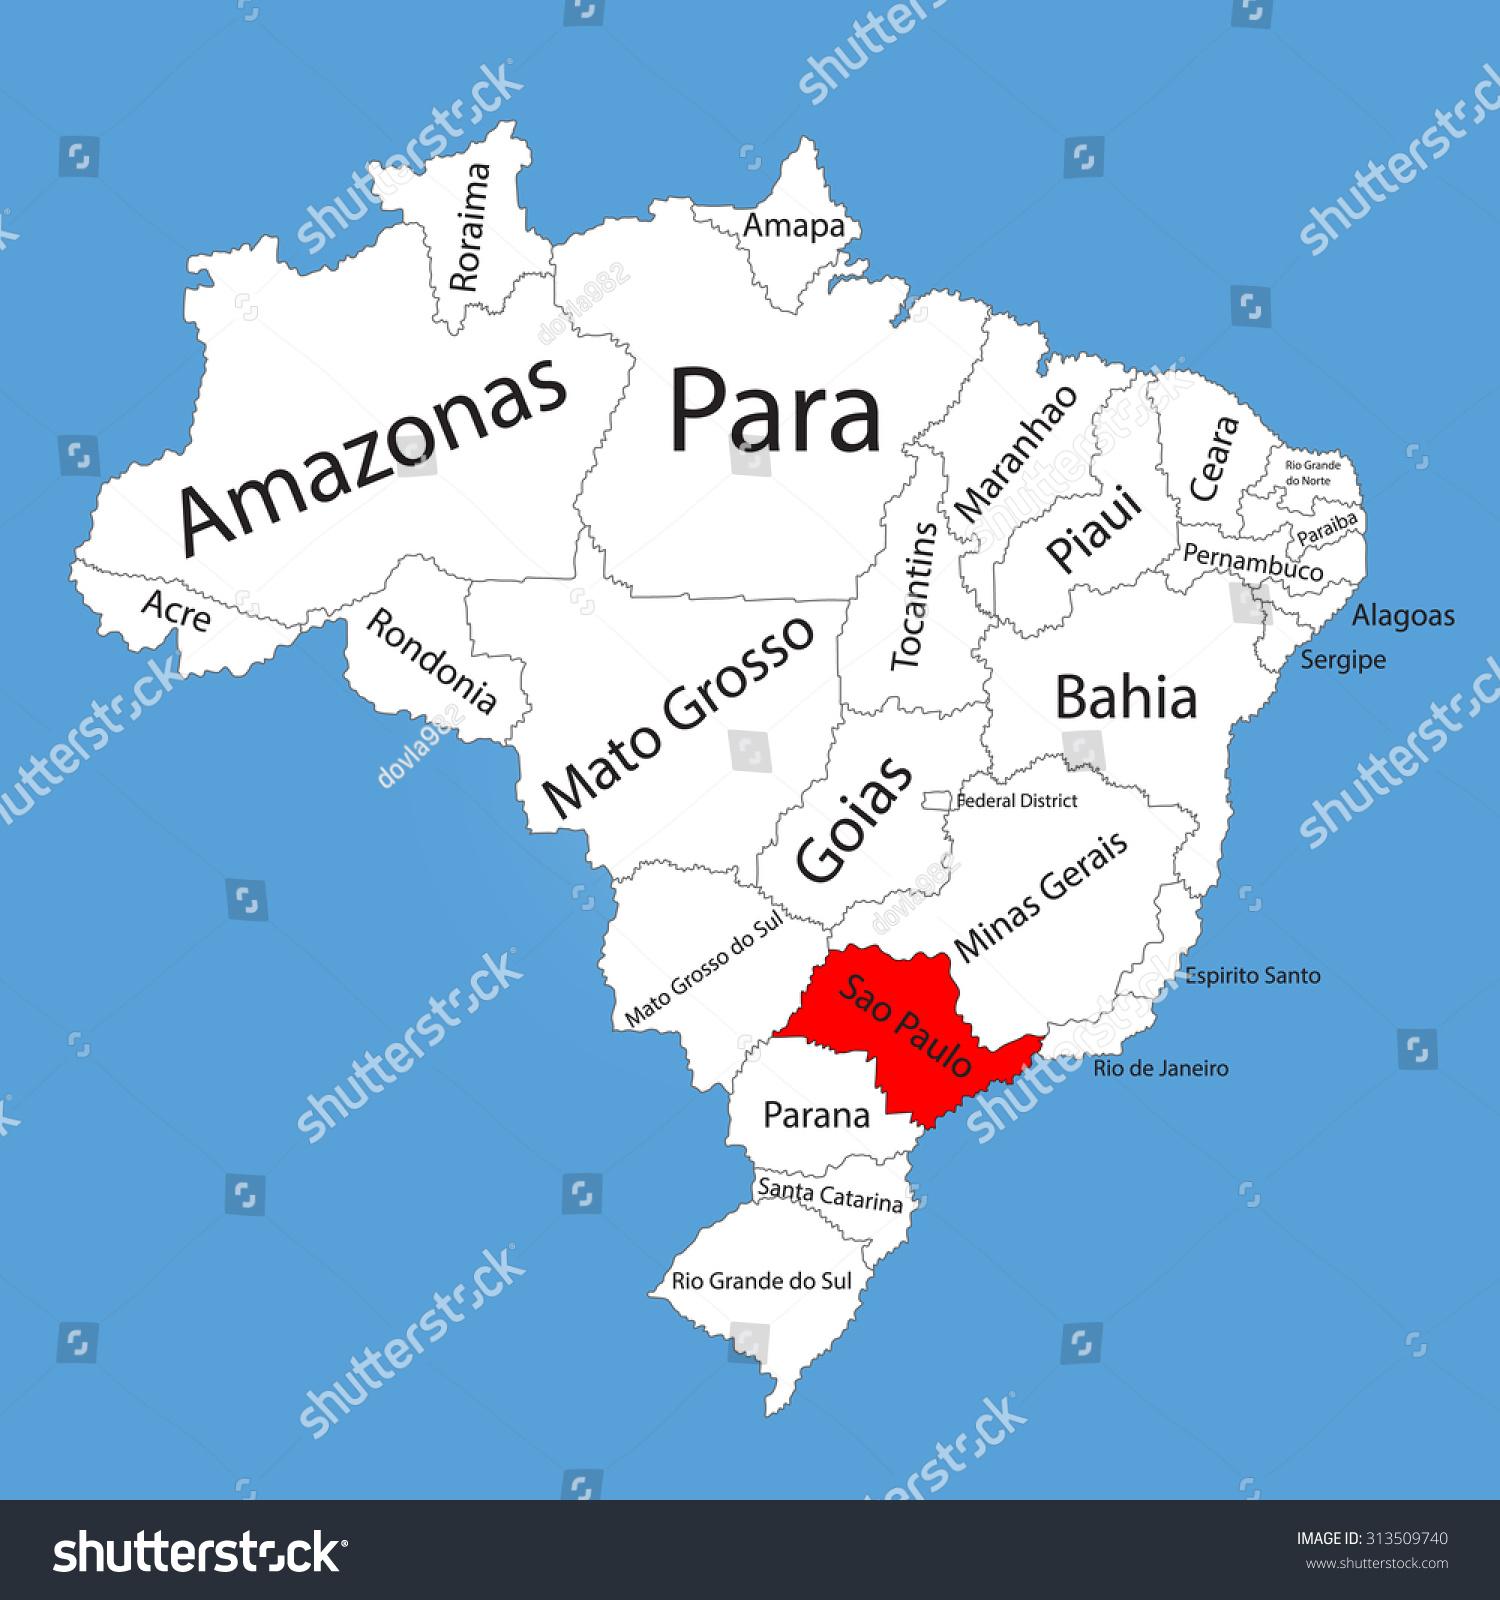 Sao Paulo Brazil Vector Map Isolated Stock Vektorgrafik